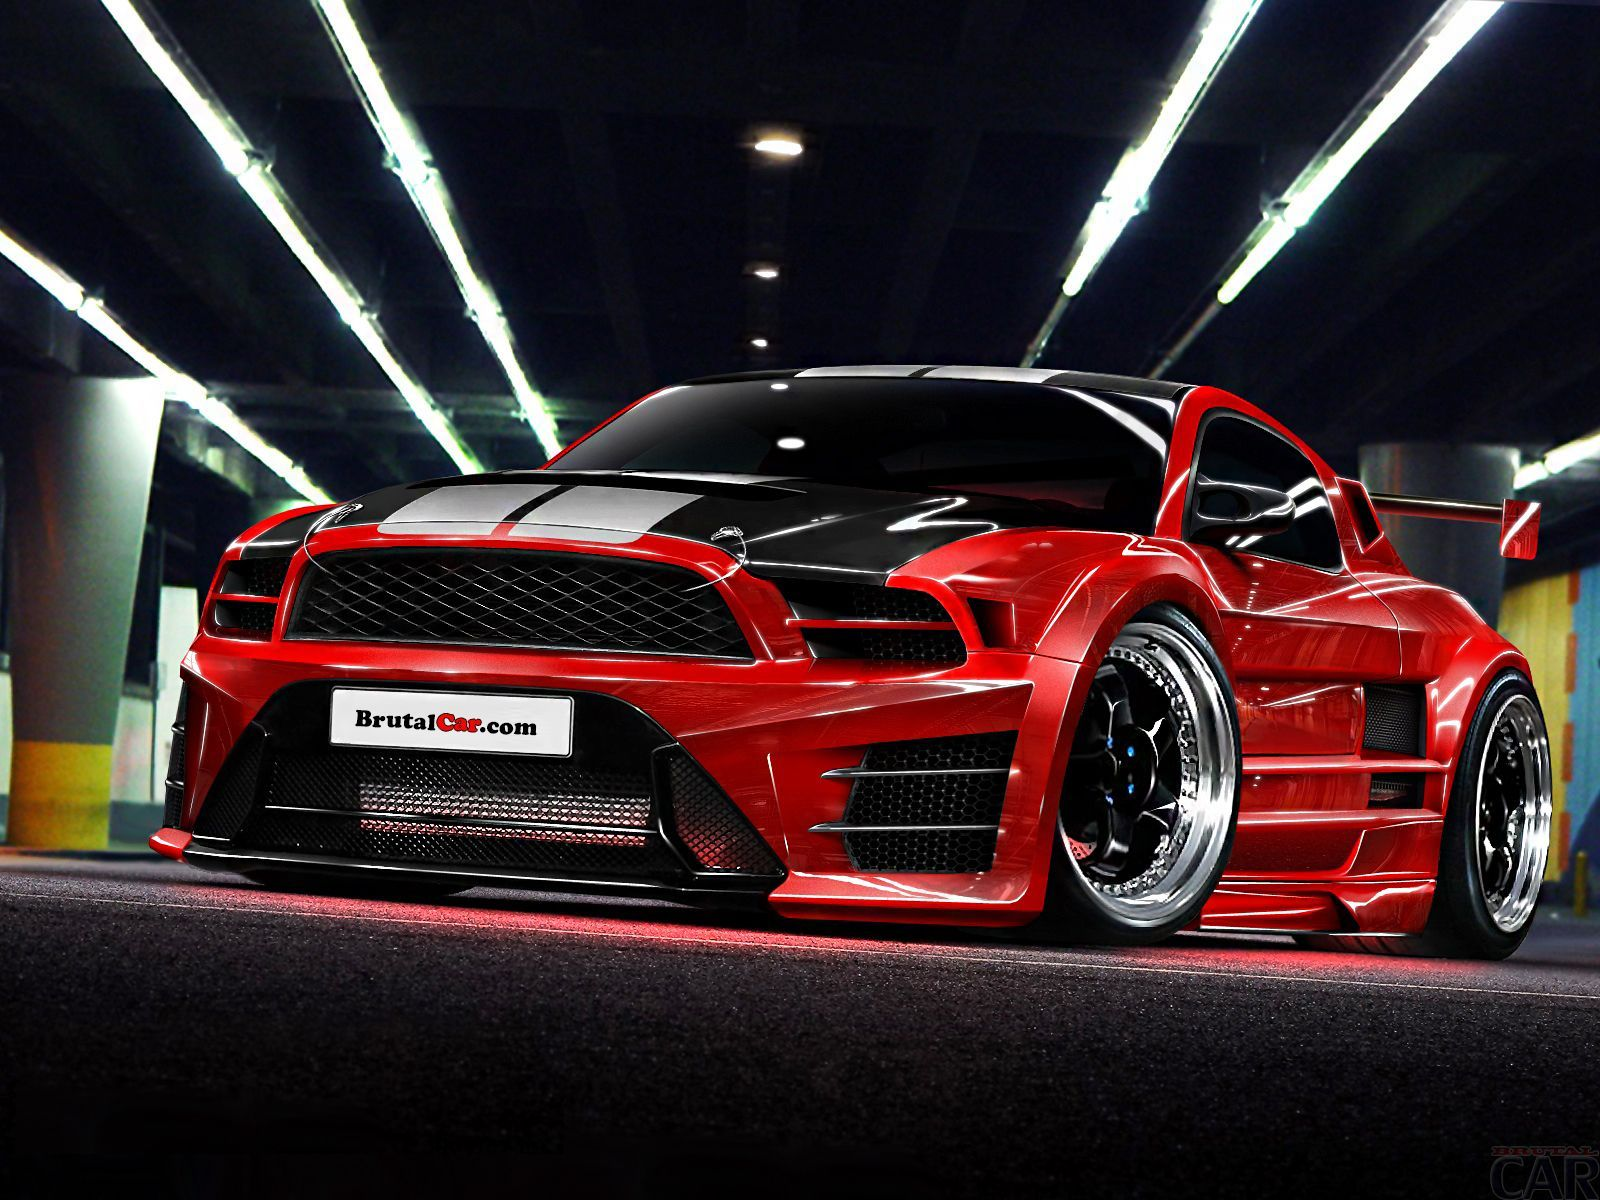 Mustang custom red ford mustang looks so fantastic